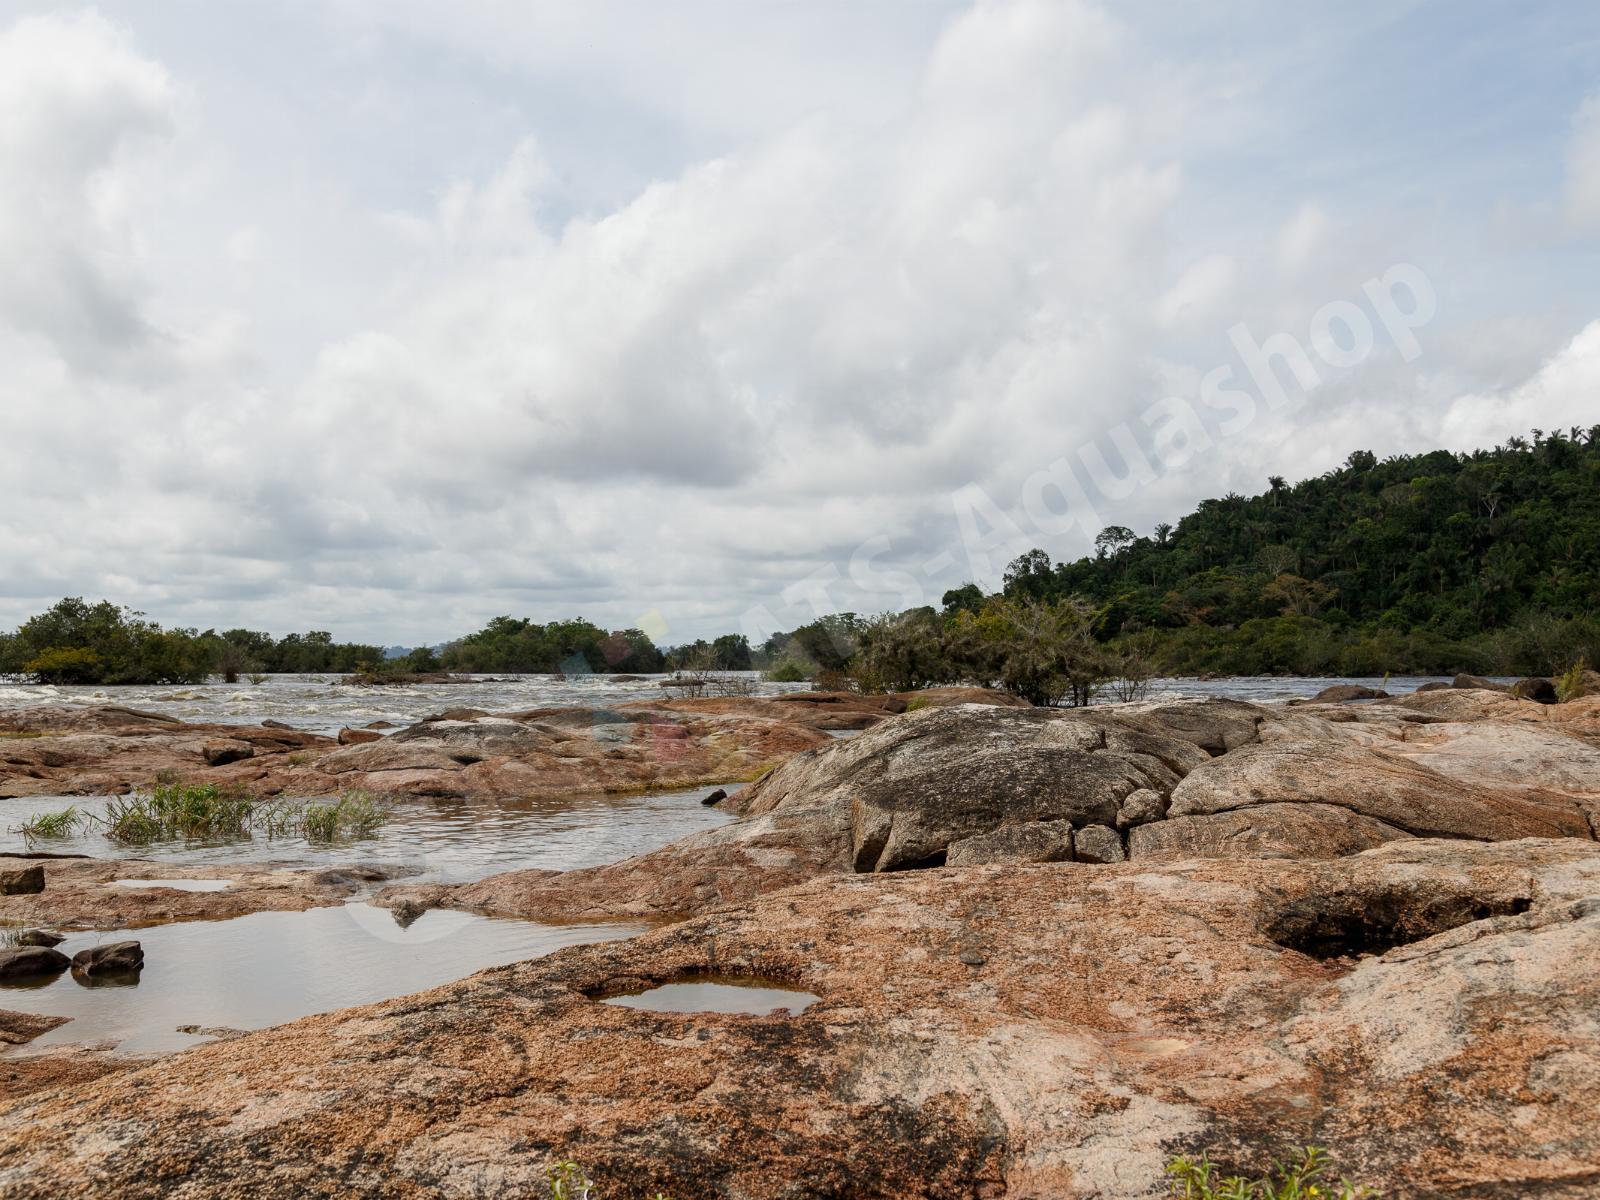 rio xingu cachoeira do jericoa andreas tanke 0198 9